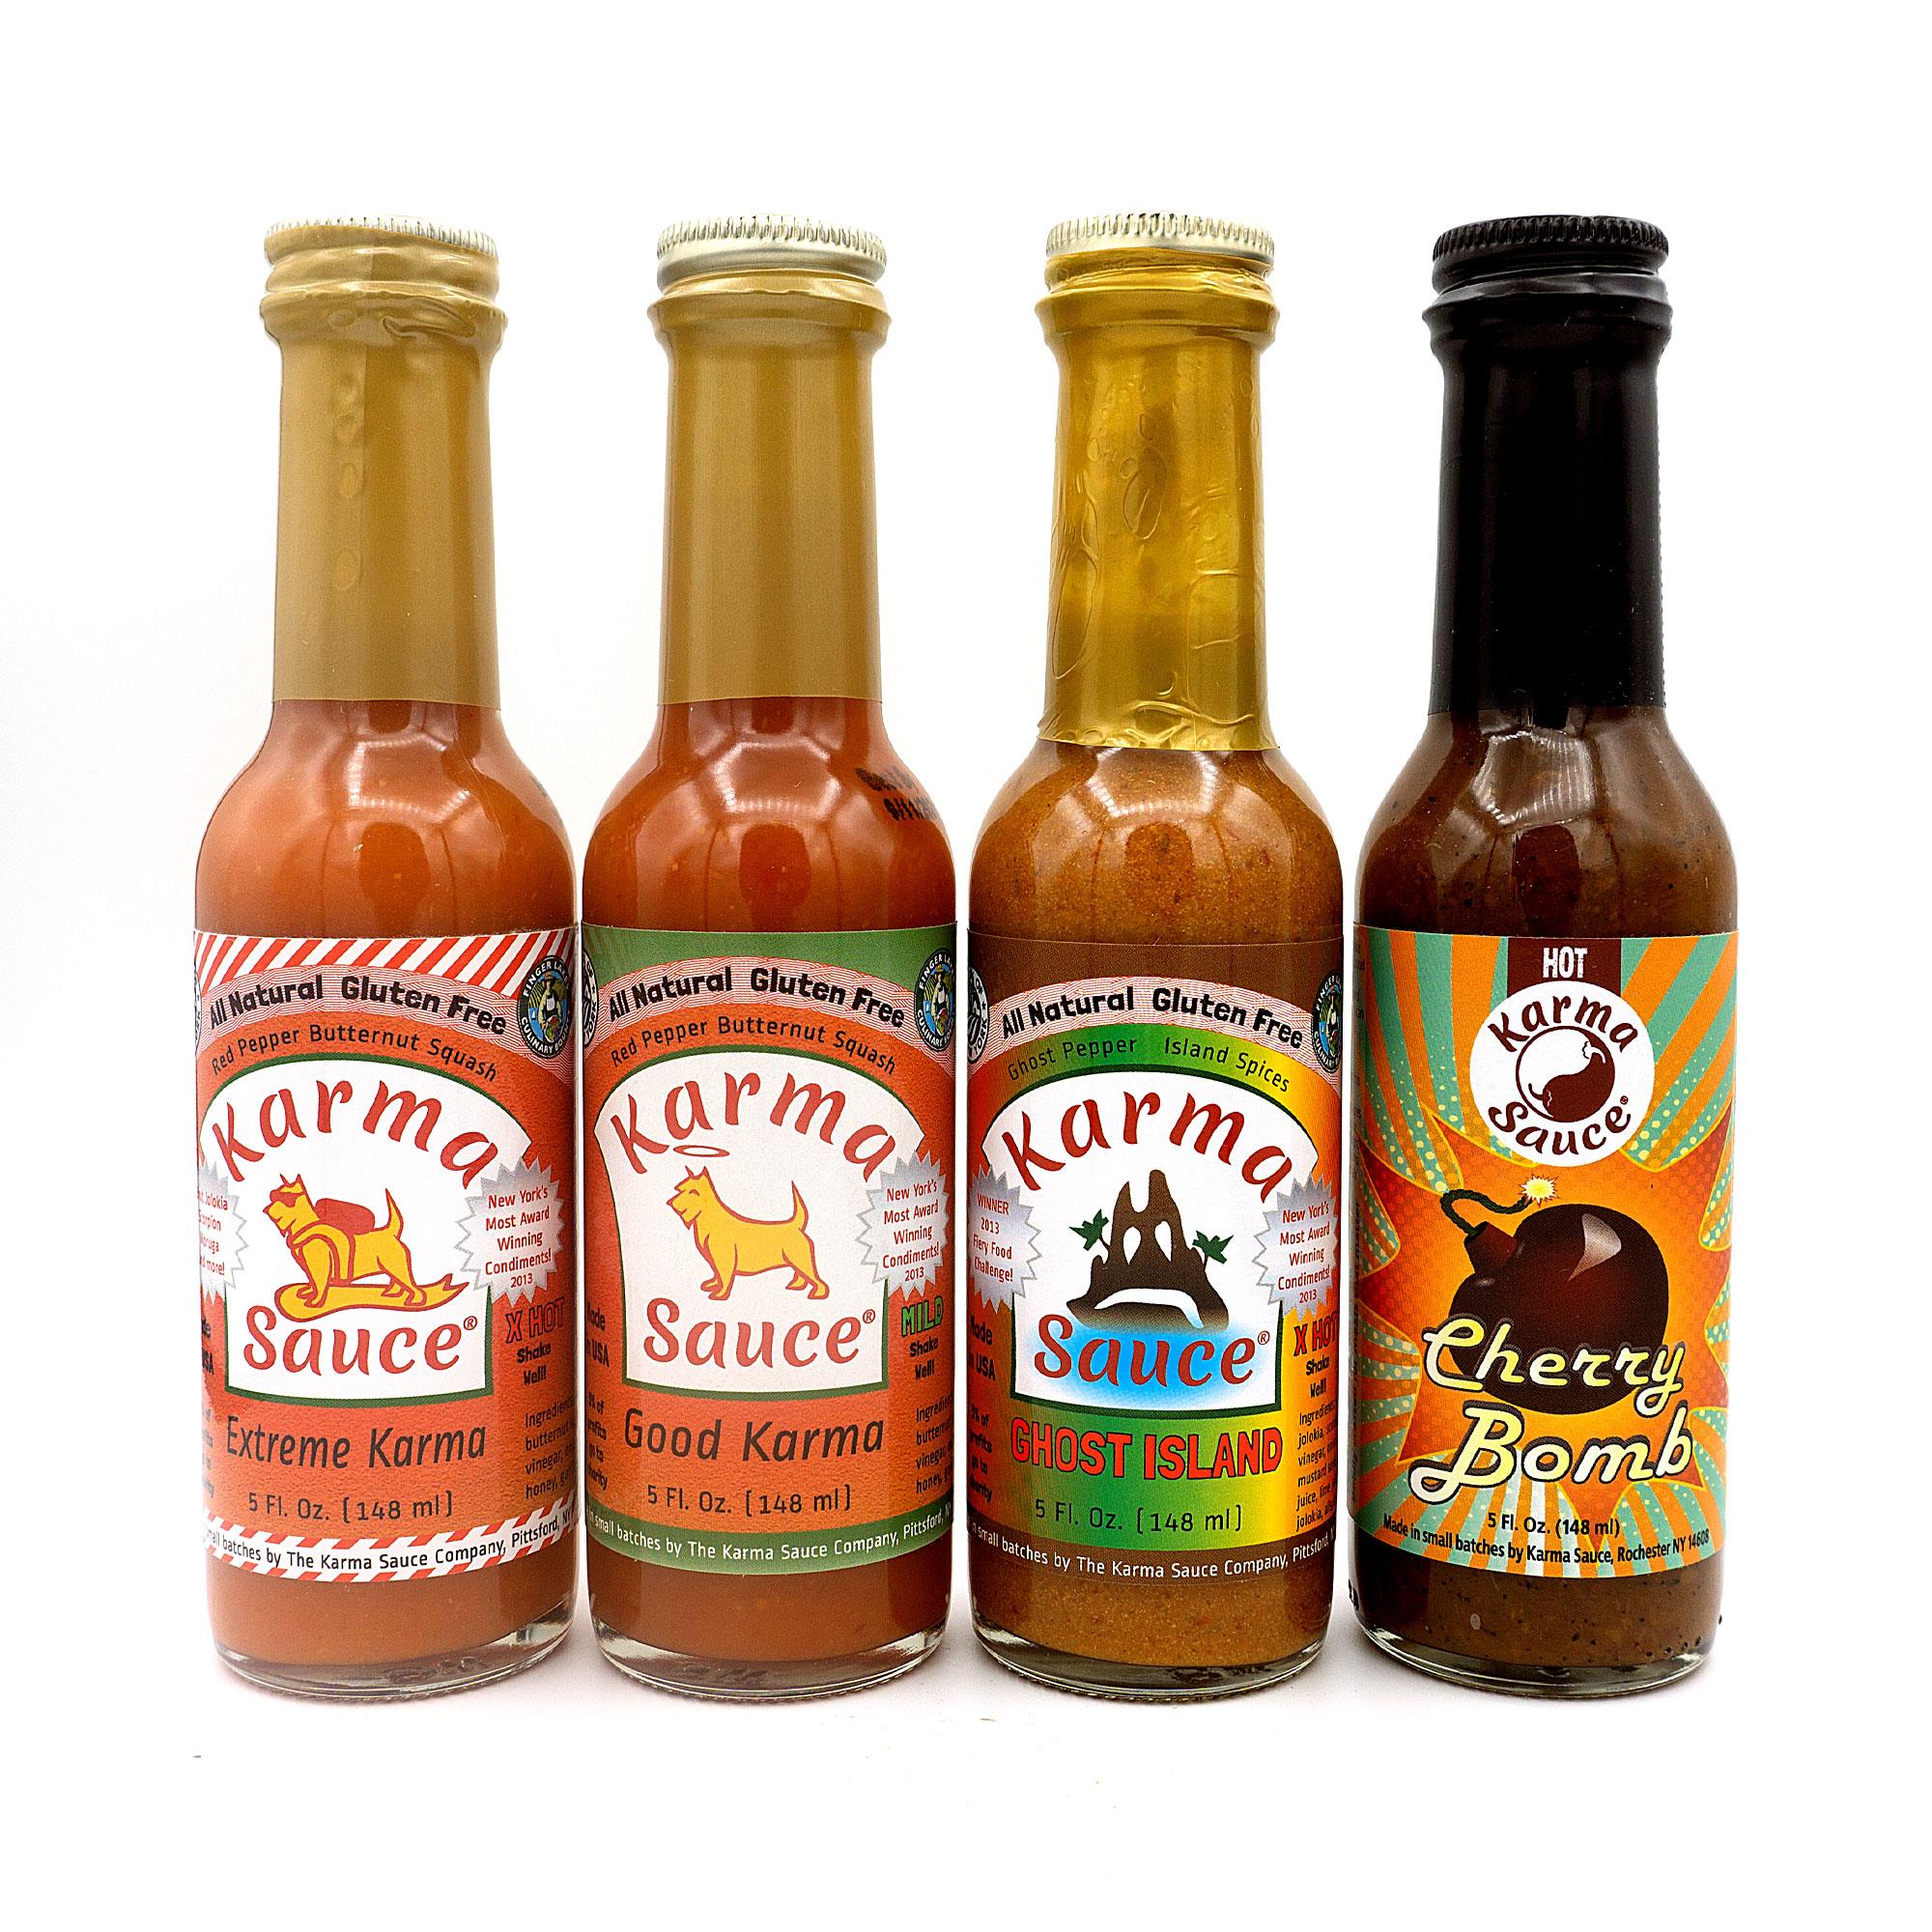 Karma Sauce | Mat's Hot Shop - Australia's Premier Hot Sauce Store